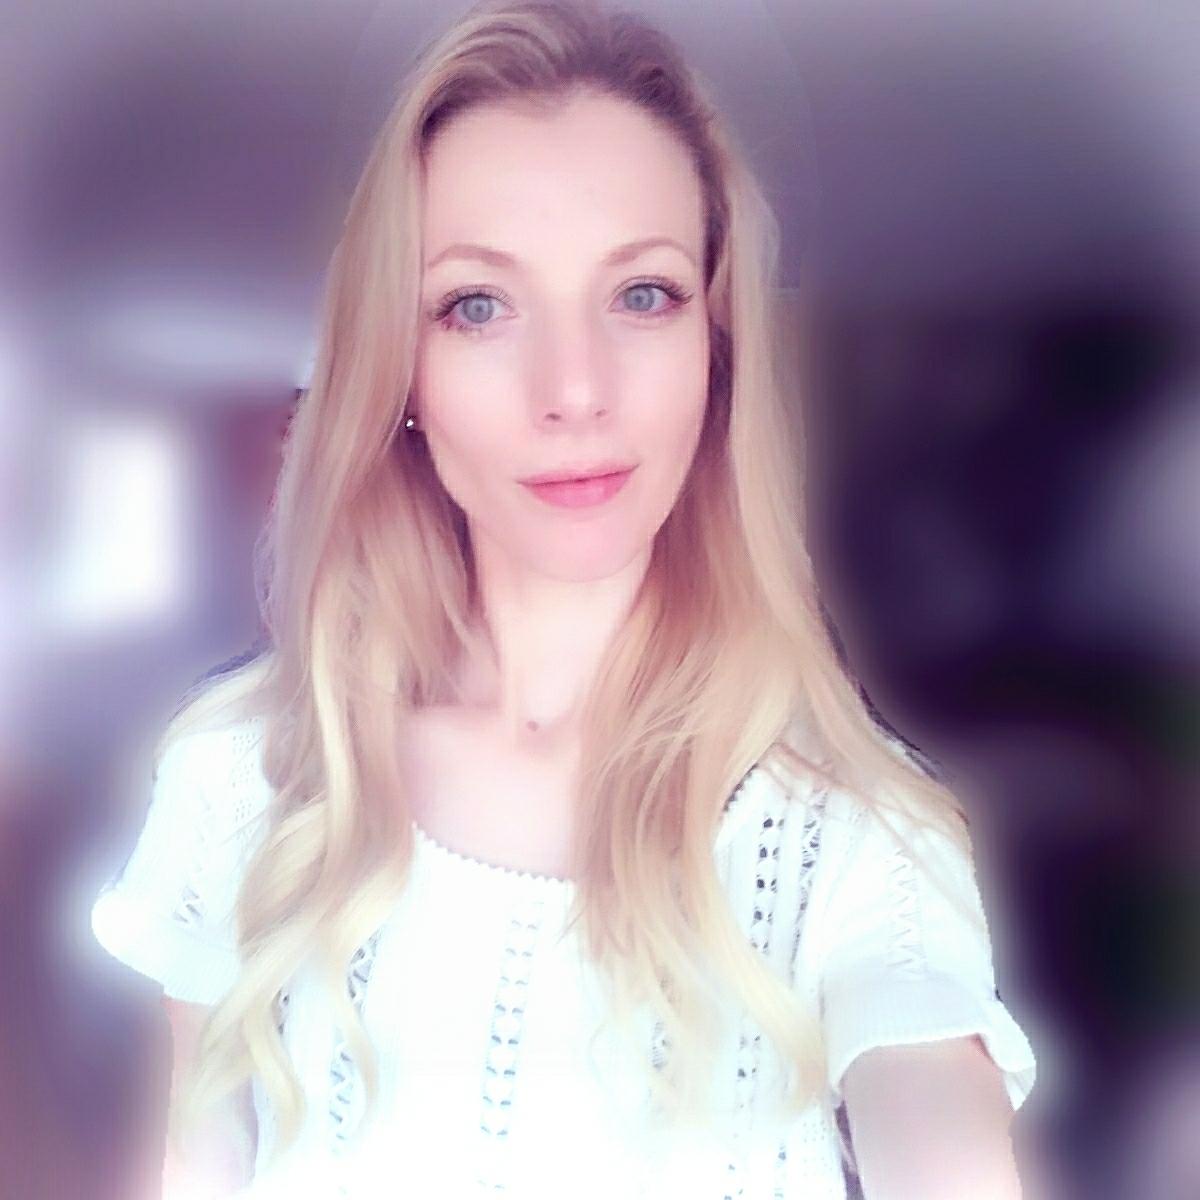 Erica BruCe, Spring 2018 Student